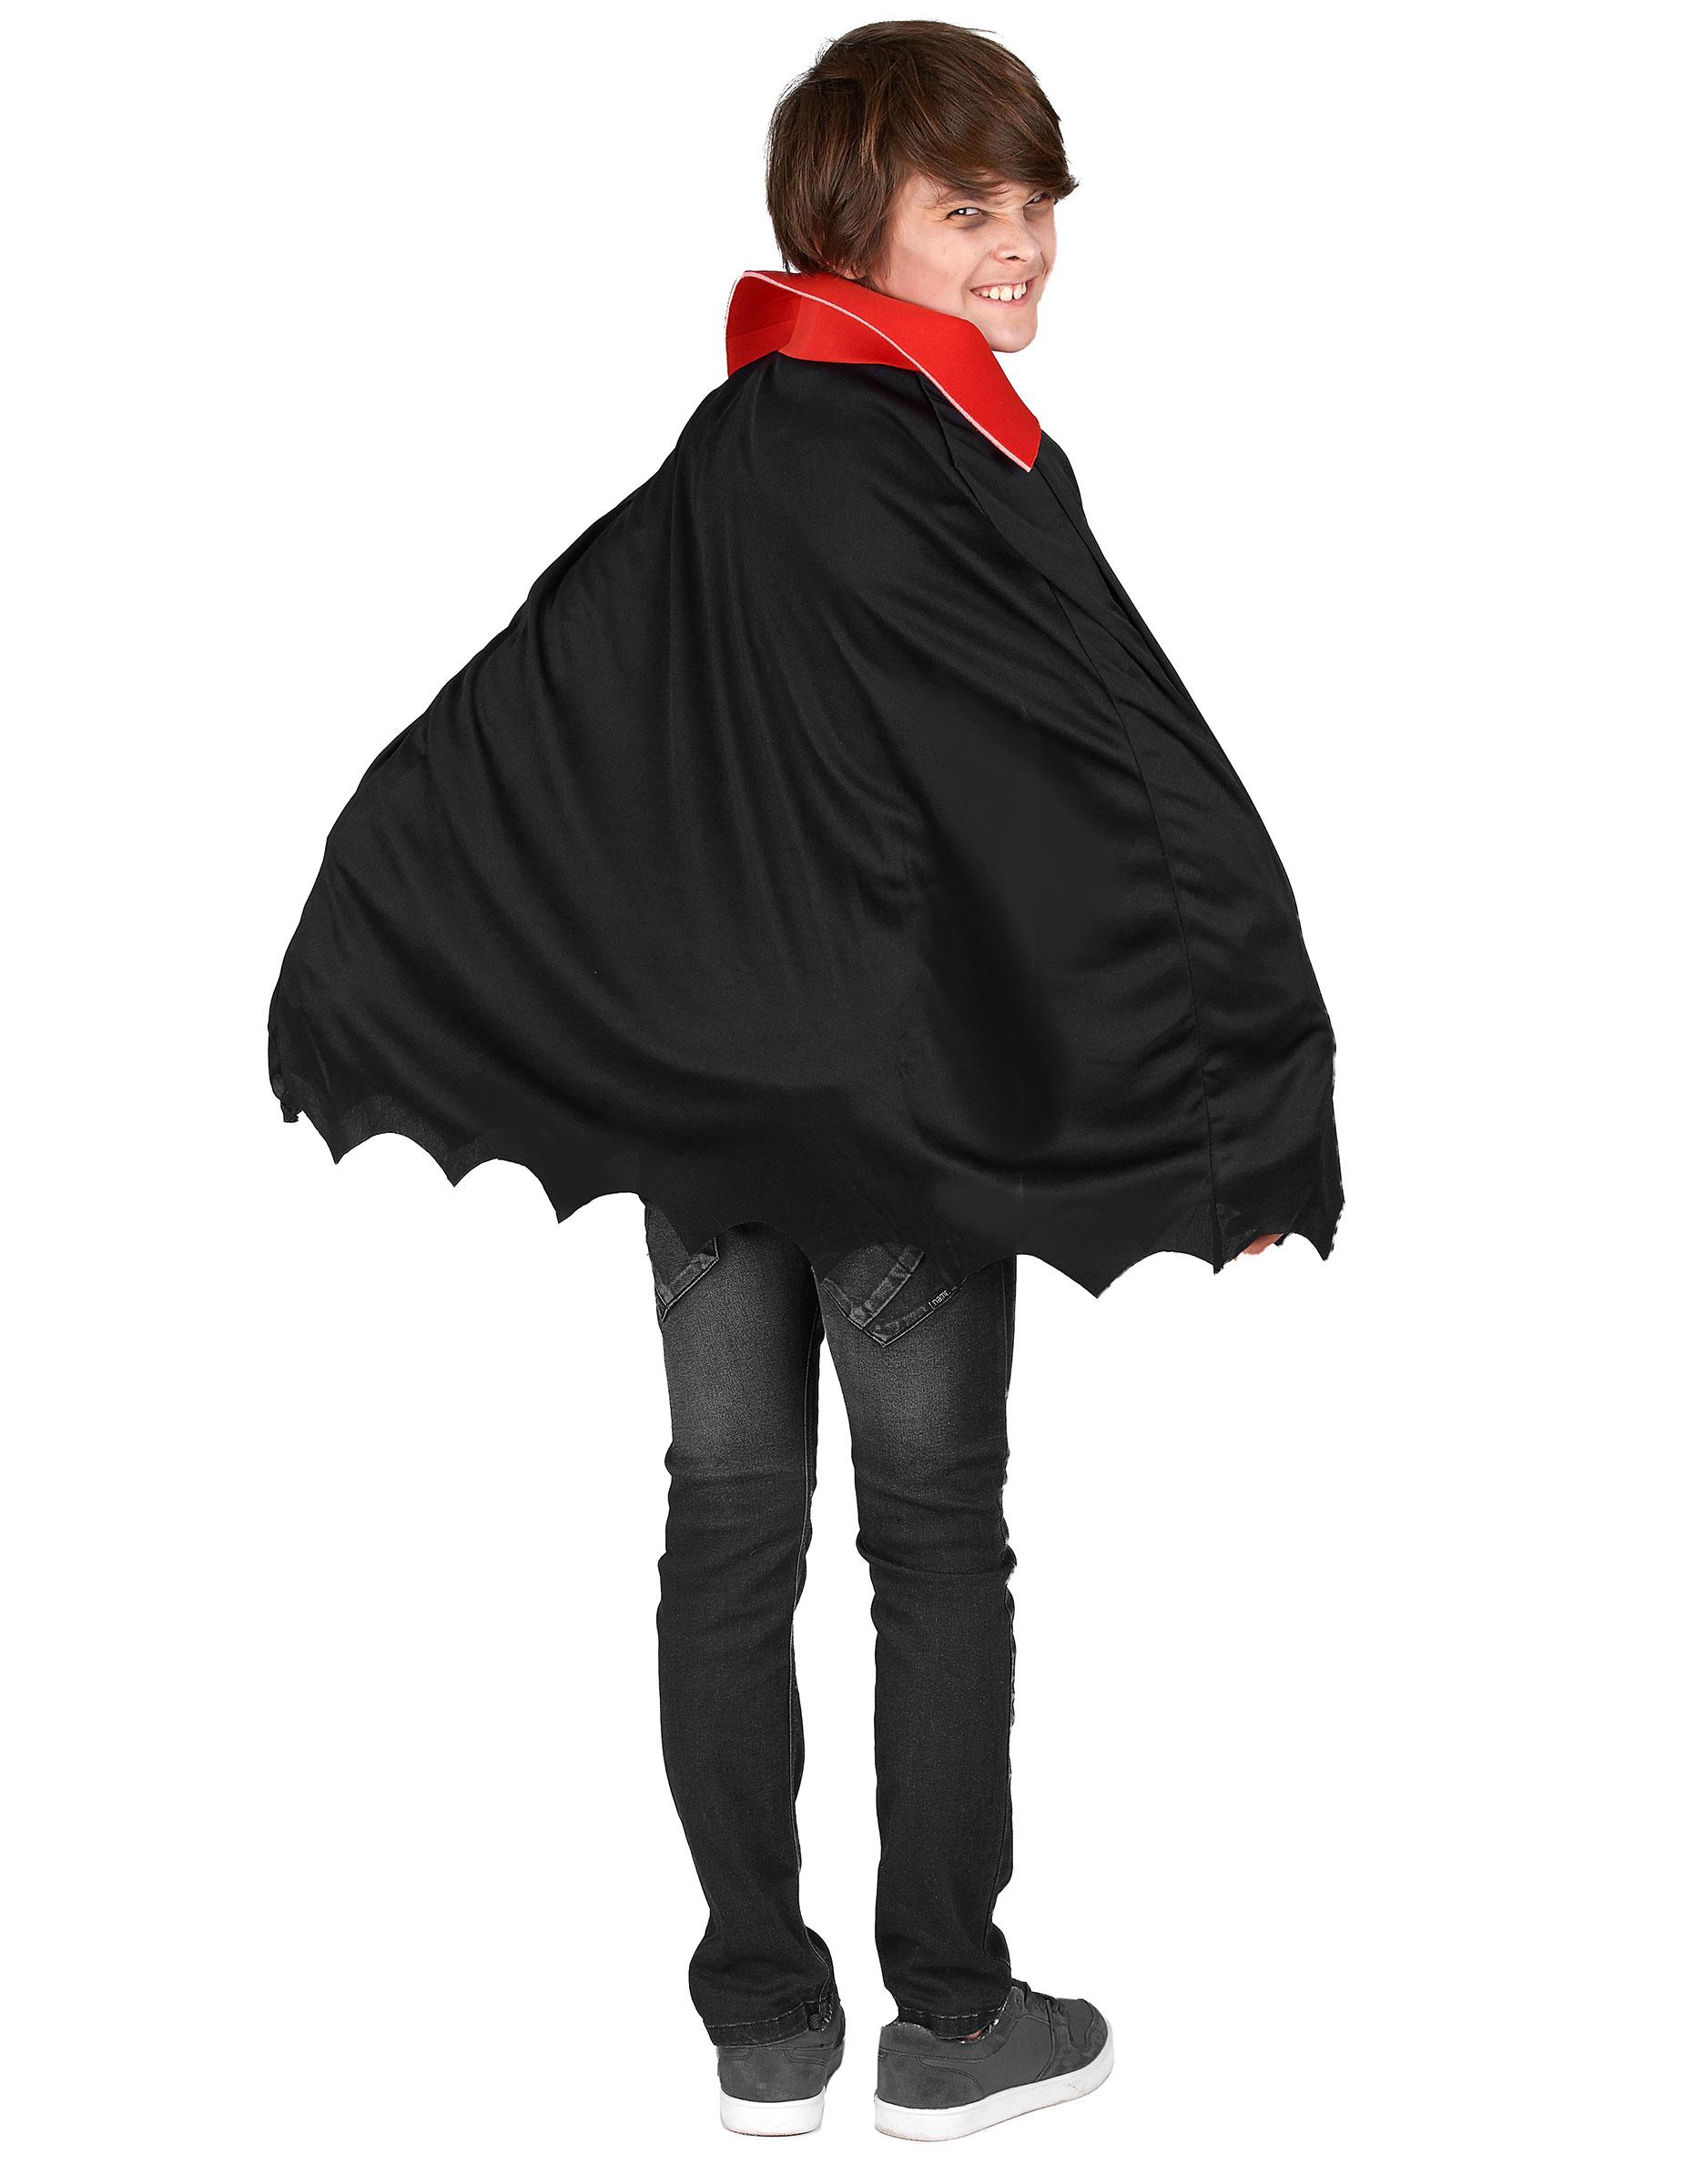 d guisement vampire gar on halloween deguise toi achat. Black Bedroom Furniture Sets. Home Design Ideas